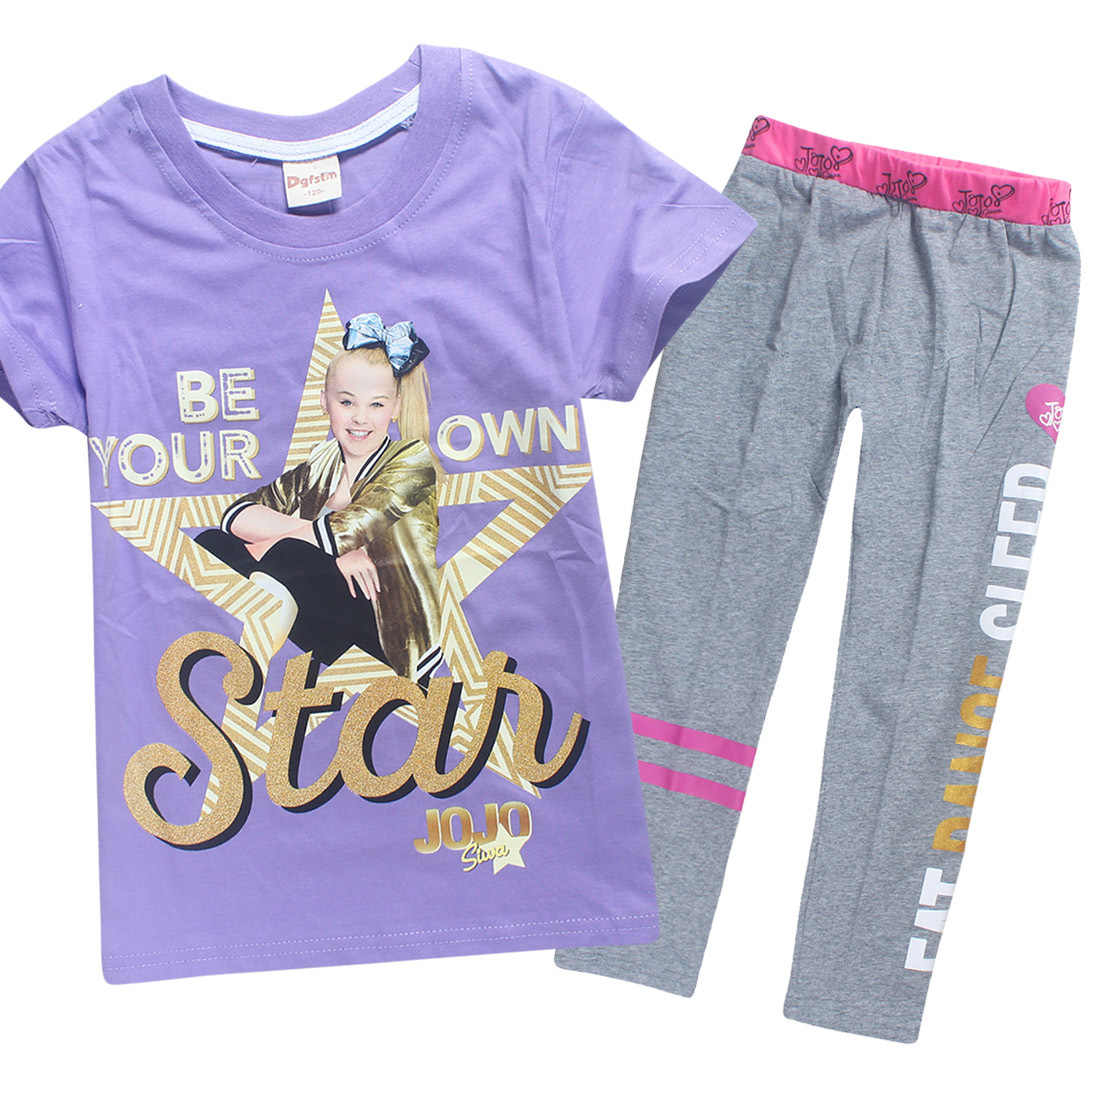 2c84890cc8 Summer Fashion Short Sleeve Fashion Pure Cotton 2PCS T Shirts Pants  Children's Clothing Sets Kids Tracksuits for Baby Girls